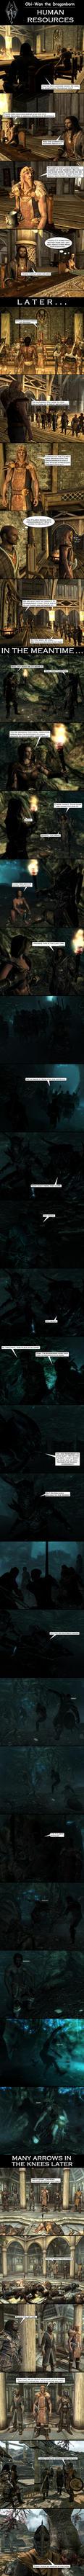 Obi-Wan the Dragonborn - Human resources by SereglothIV